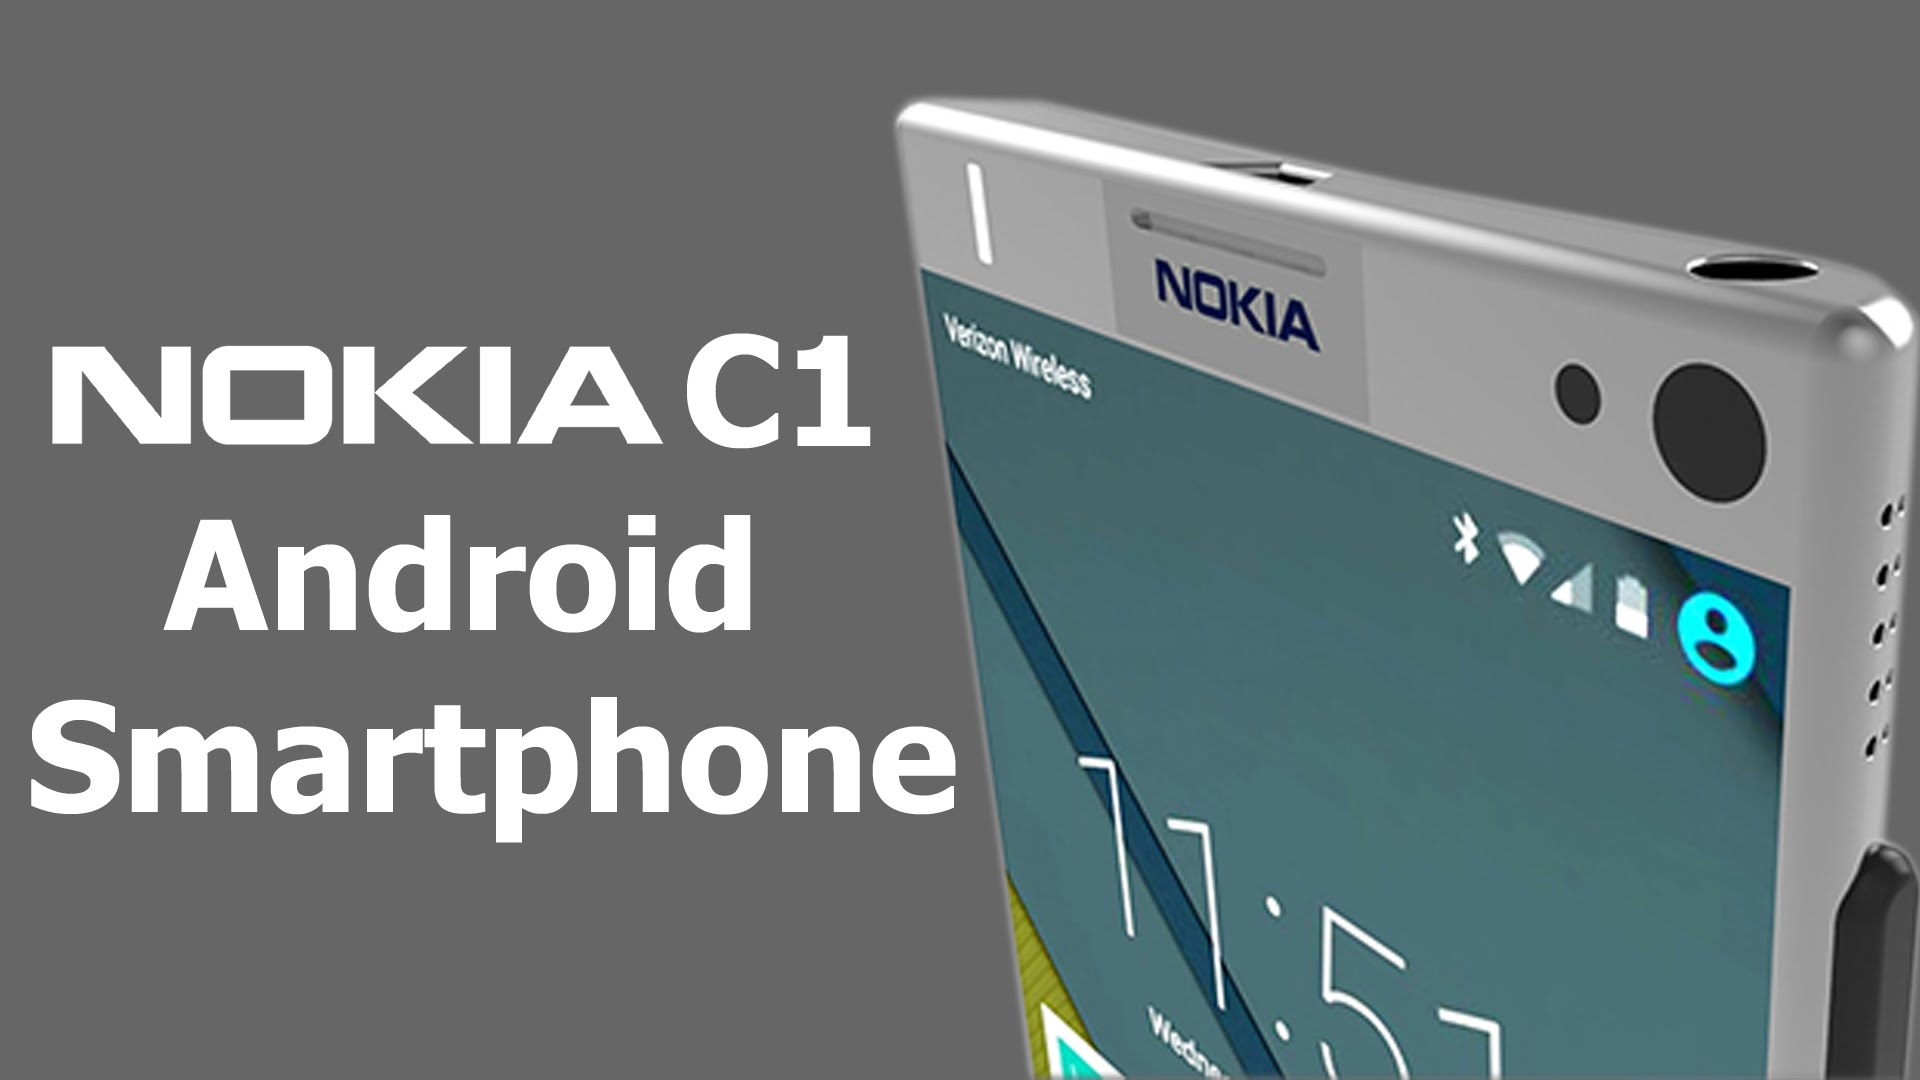 Android, al fin Nokia tendrá un terminal utilizando Android como SO